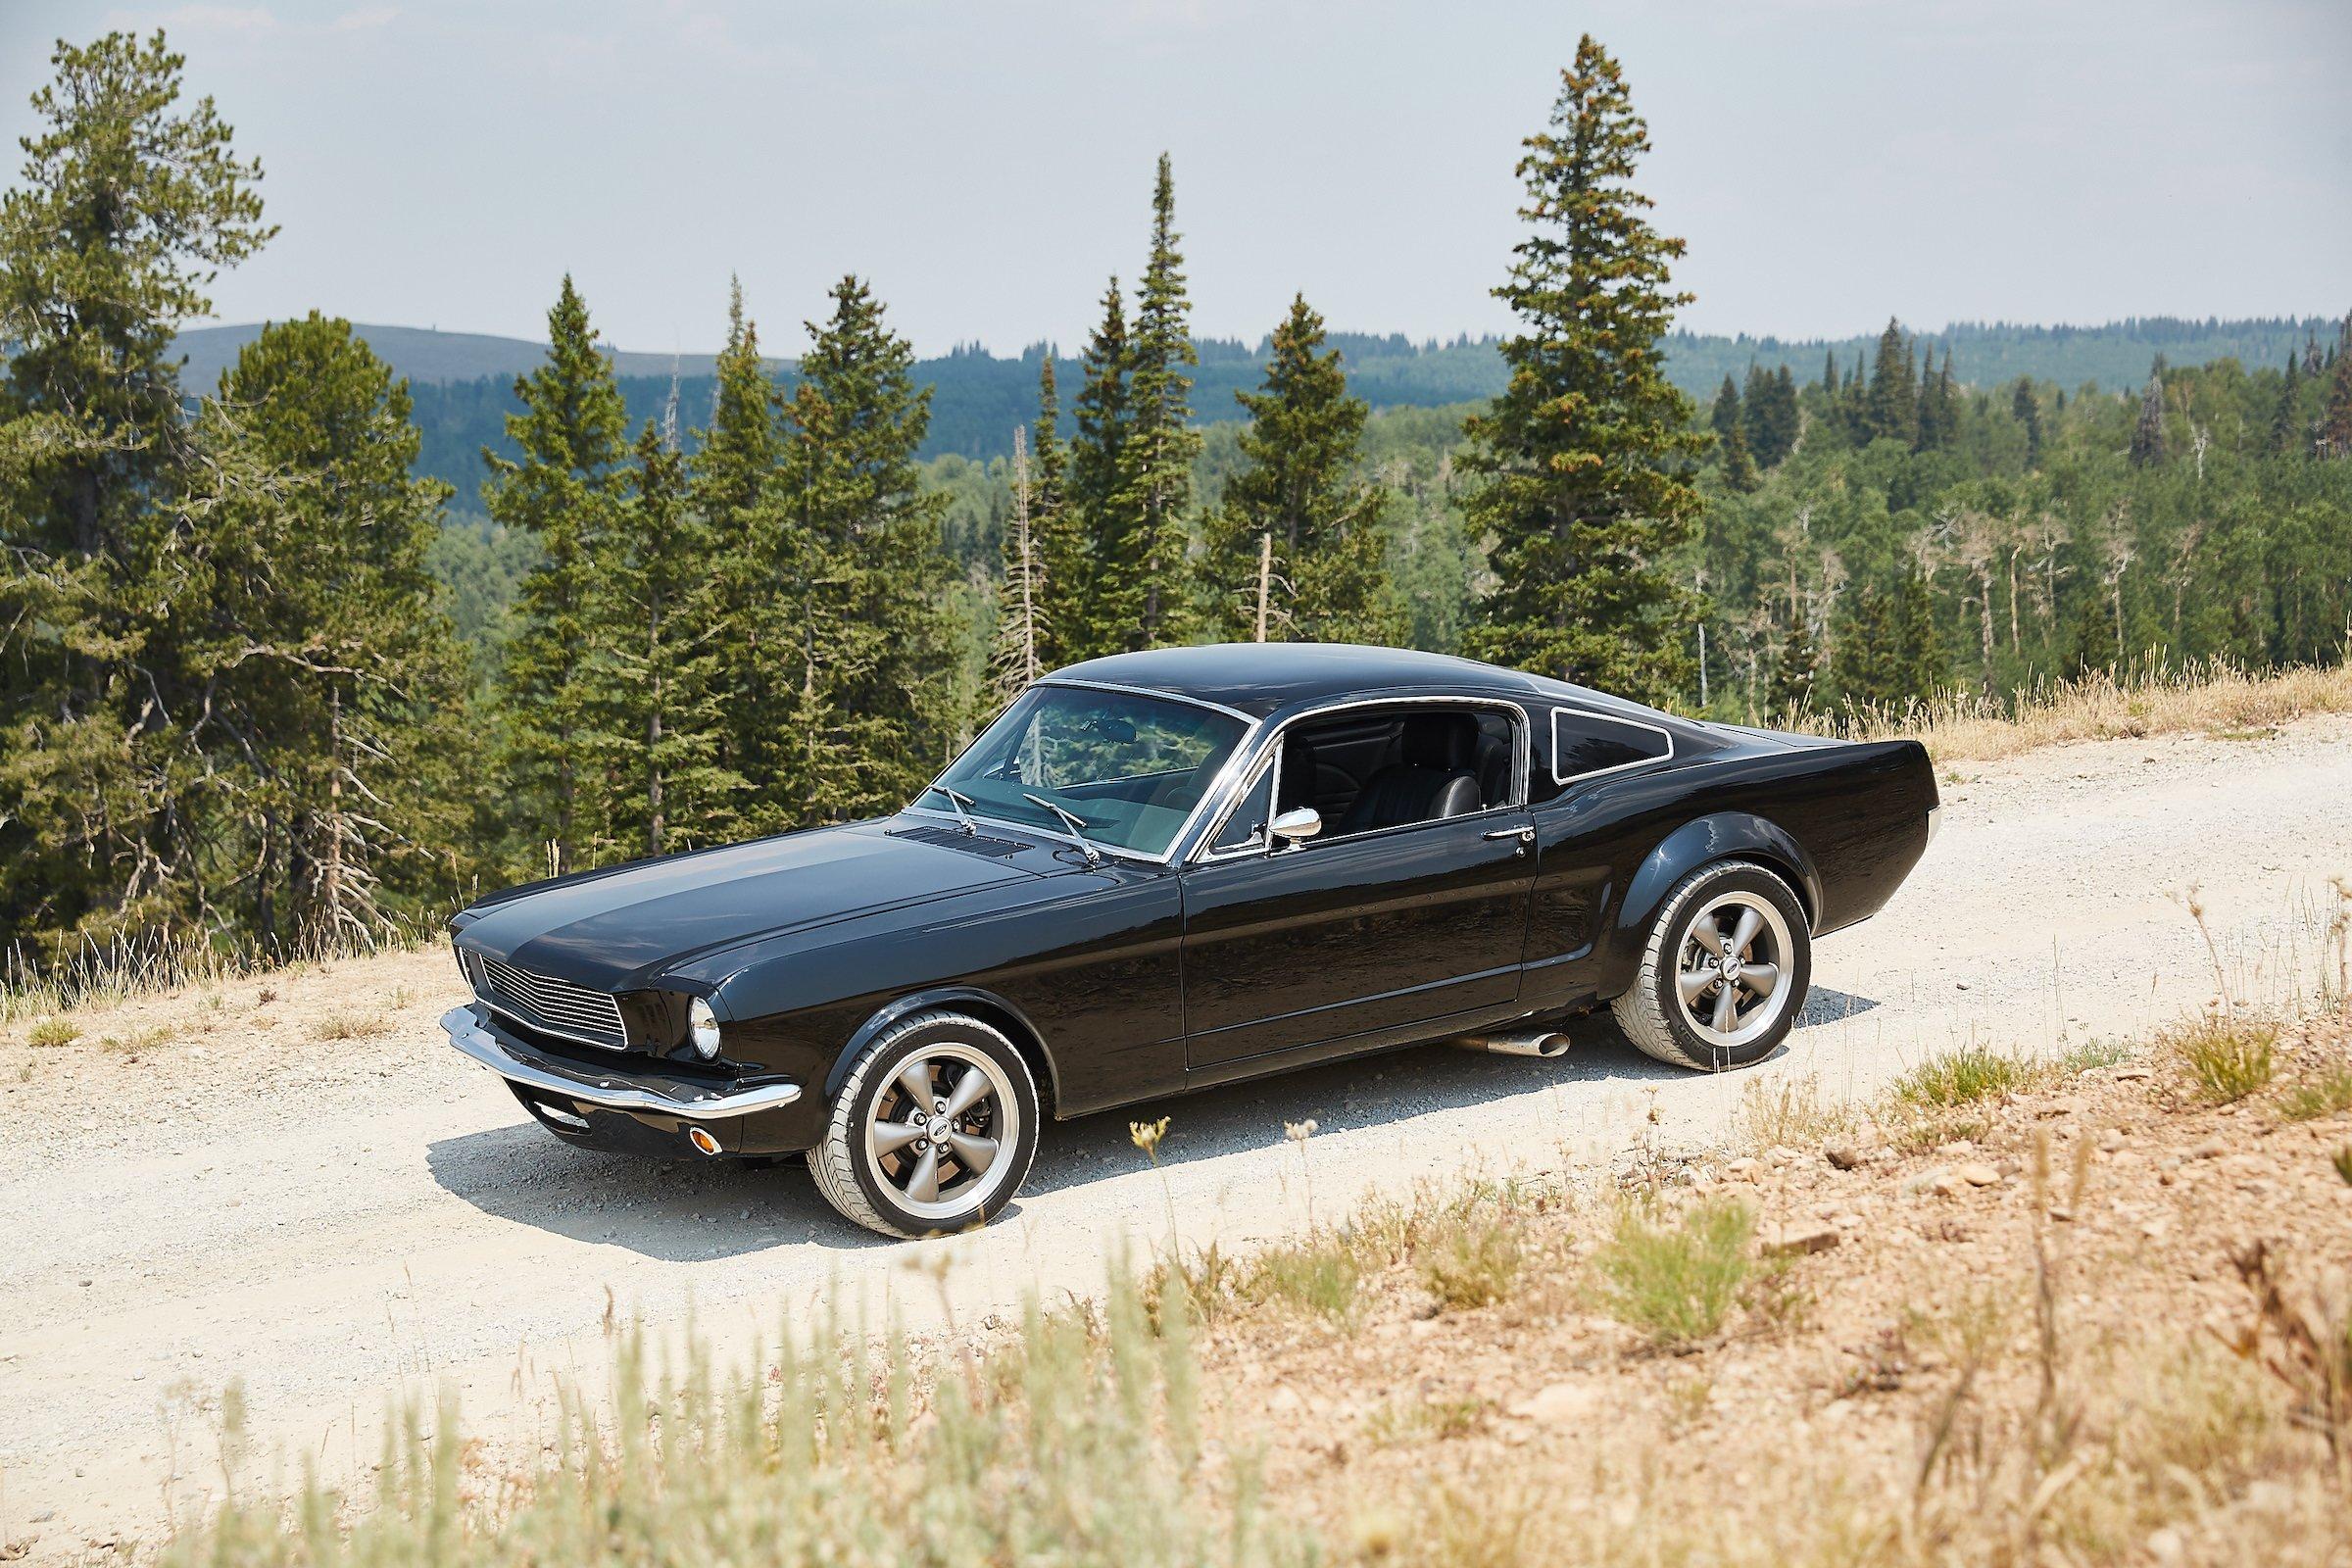 Custom Ford Mustang Patrick Dempsey 4